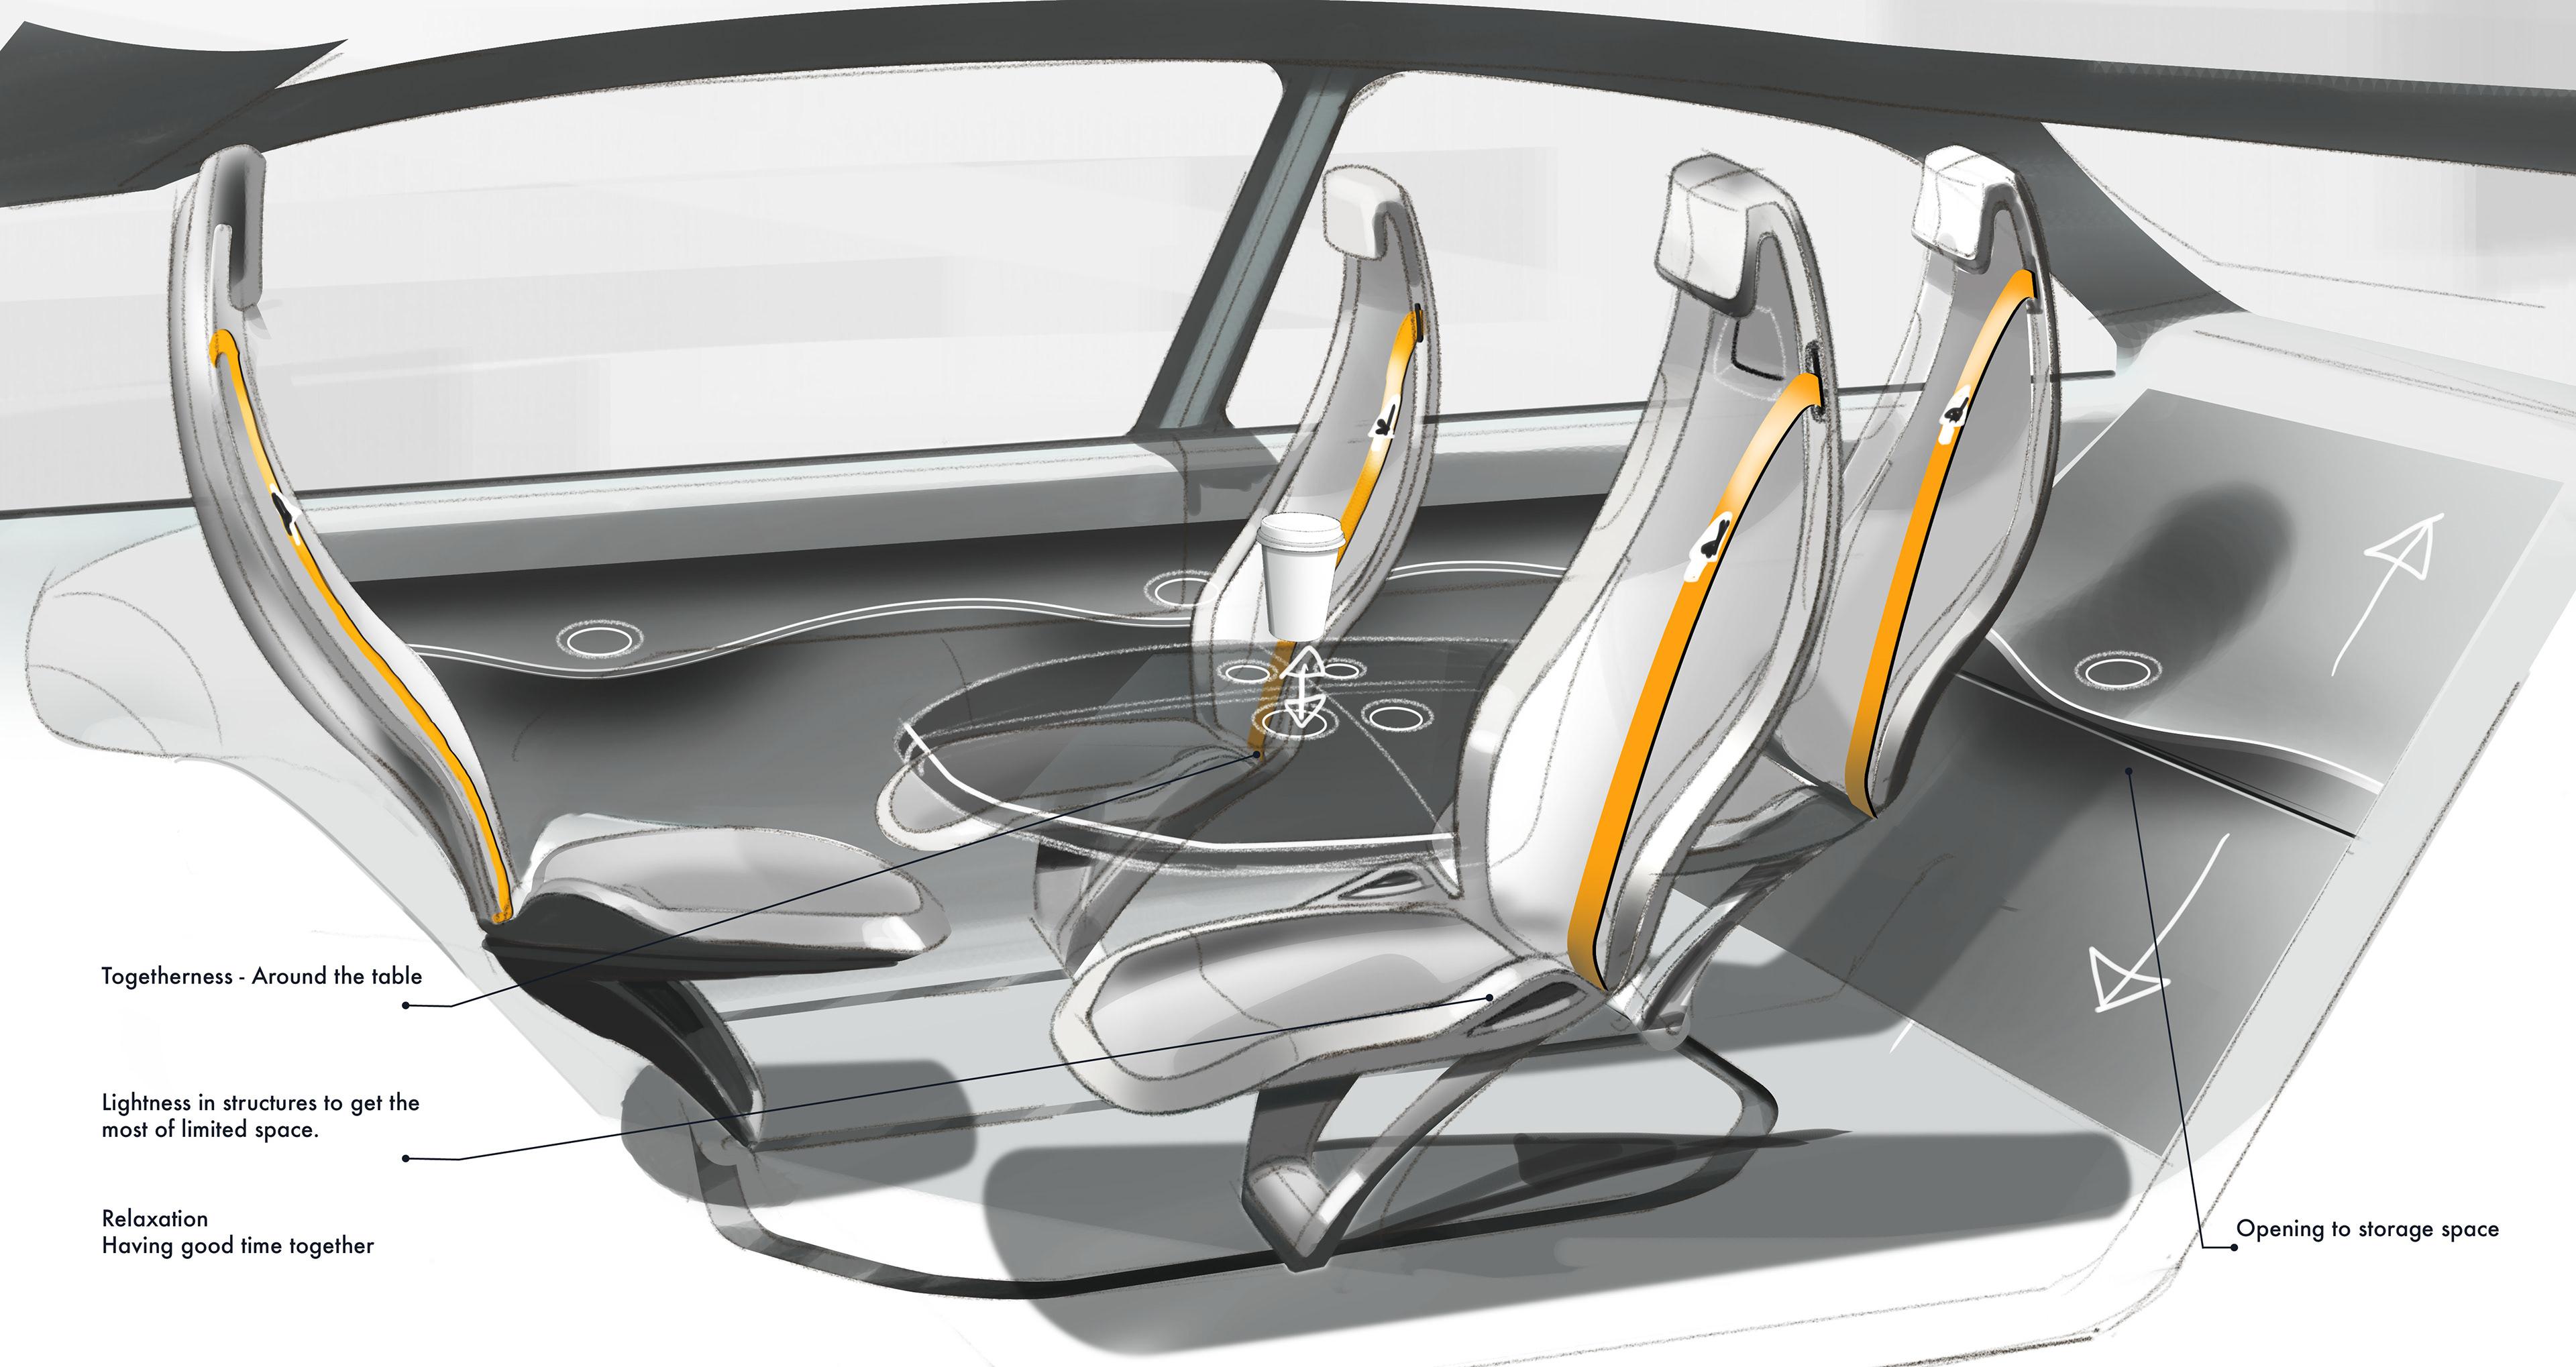 juha pekka rautio portfolio autonomous car interior concept. Black Bedroom Furniture Sets. Home Design Ideas